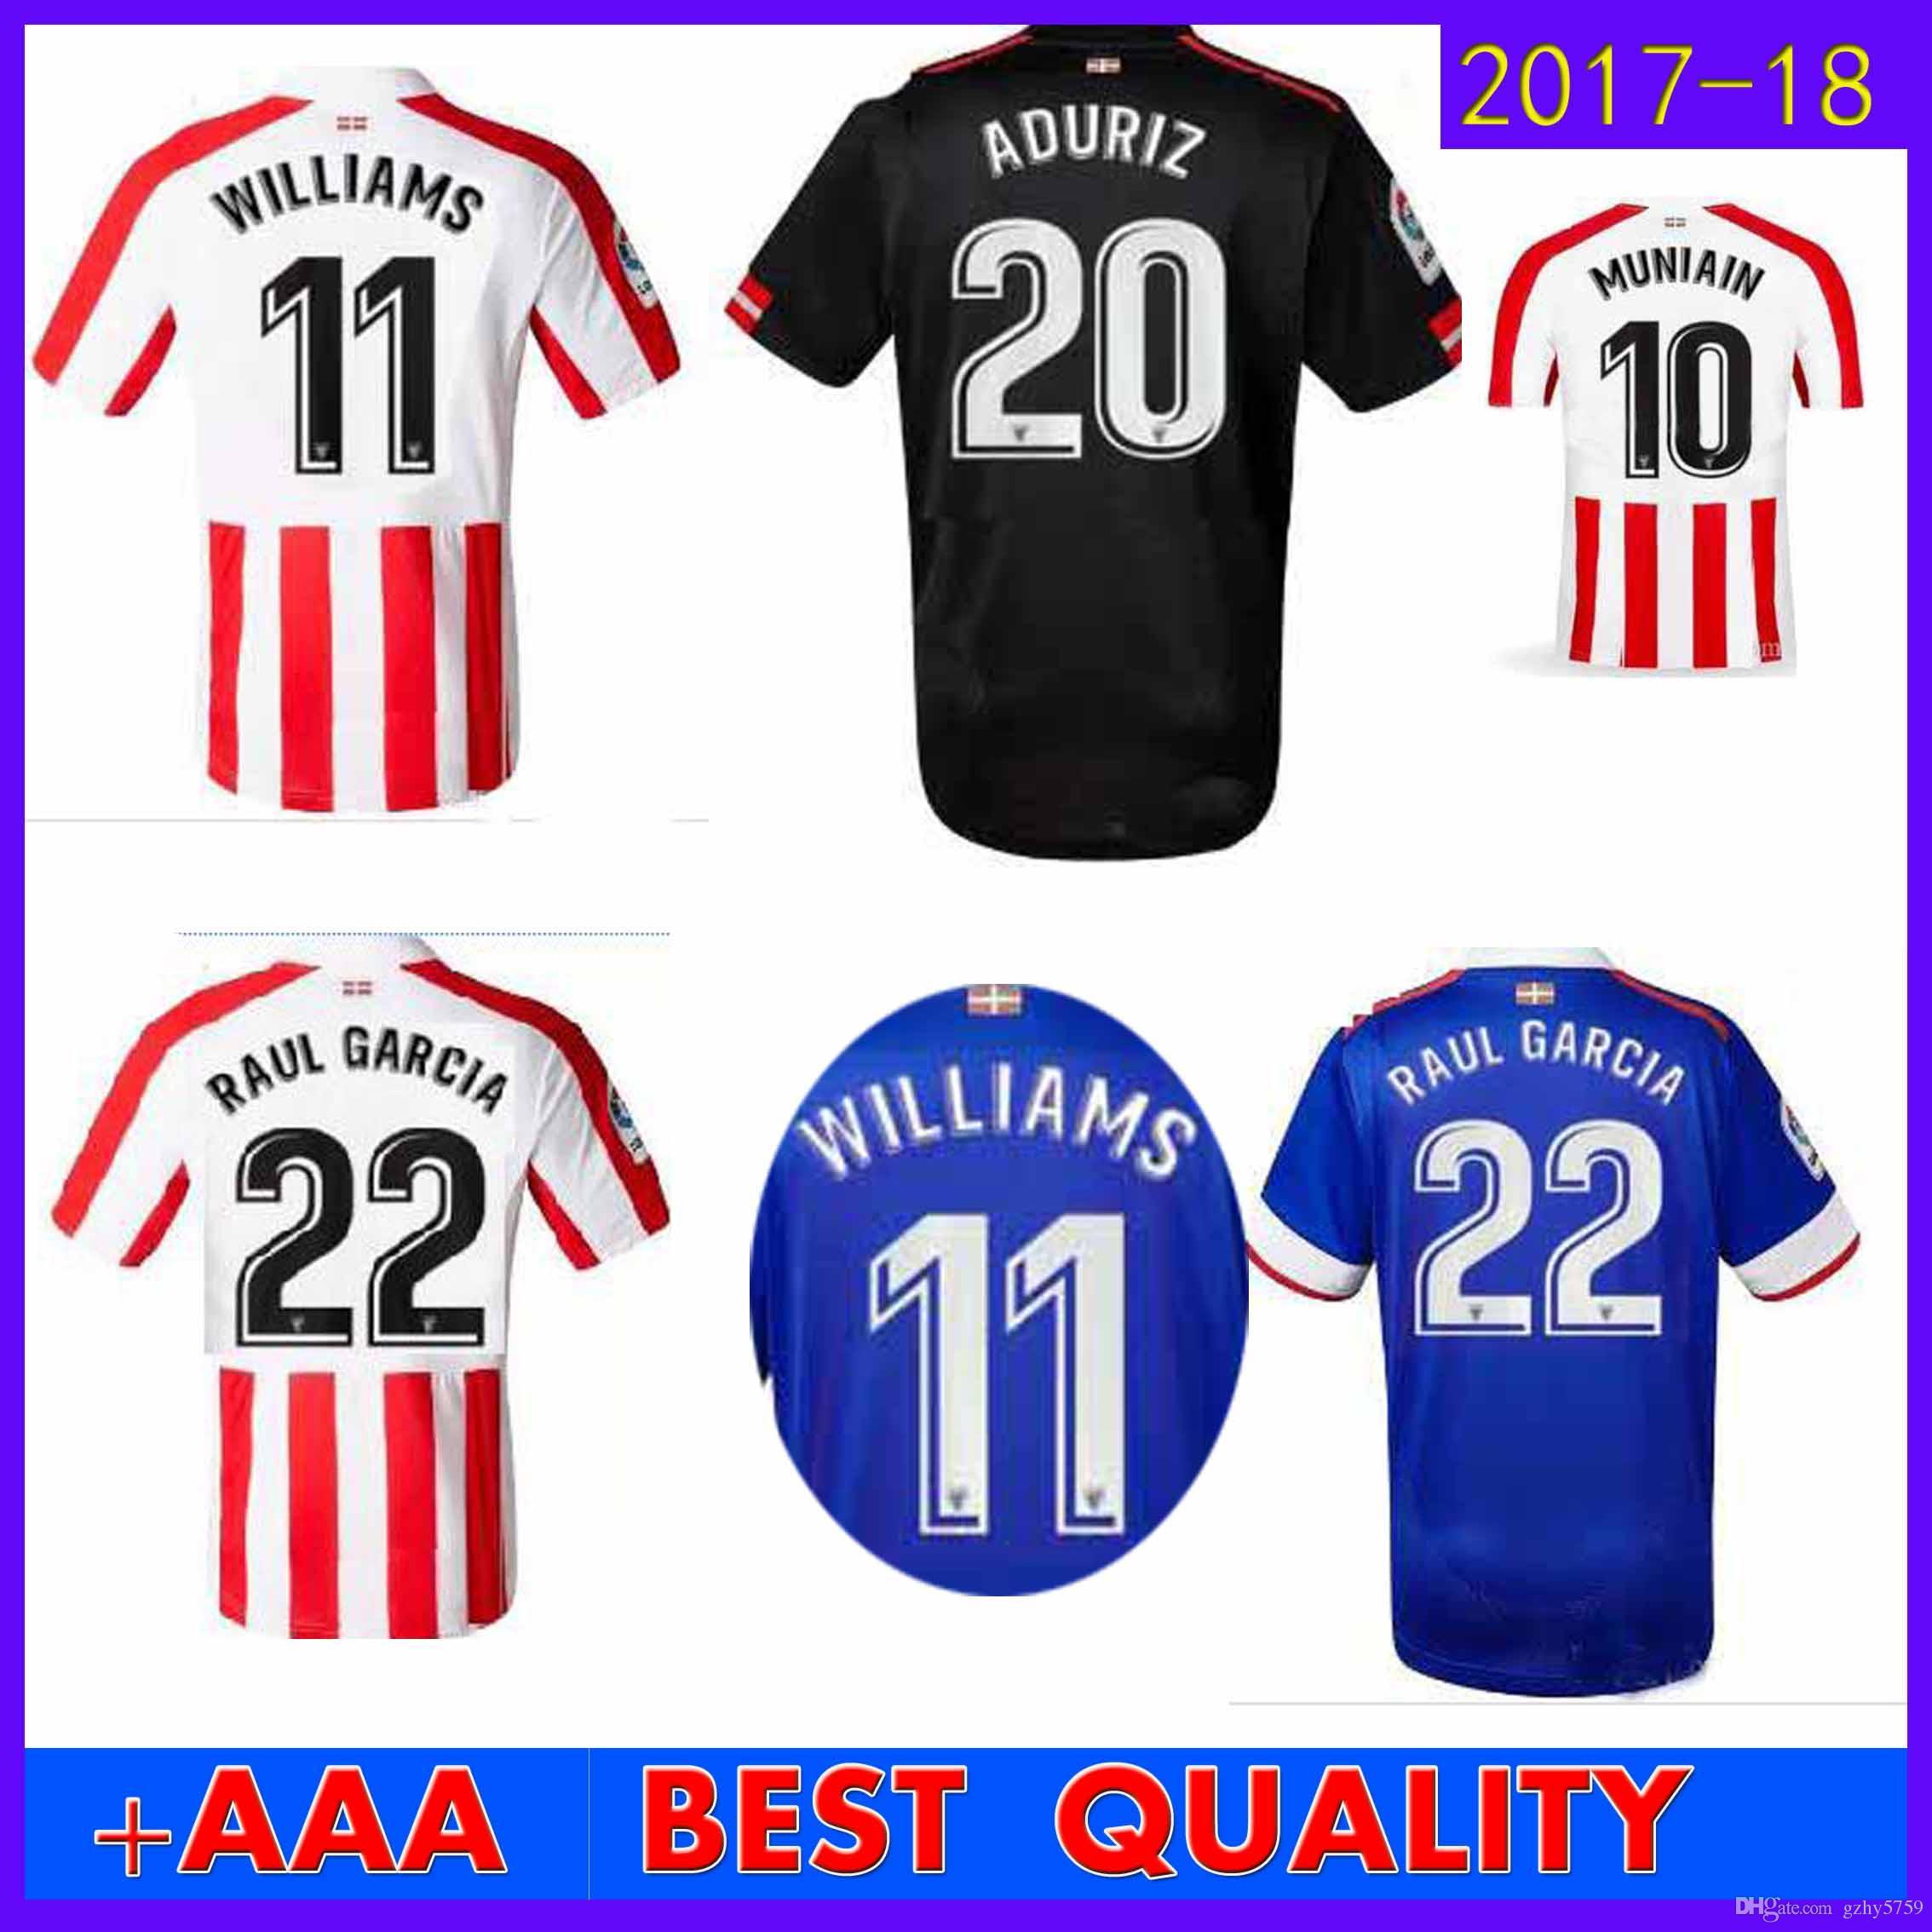 2017 2018 Athletic Bilbao Home Soccer Jersey 17 18 SUSAETA GURPEGUI MUNIAIN  Away Third Football Jerseys Shirt Best Thai Quality UK 2019 From Gzhy5759 820c369ba7ed6